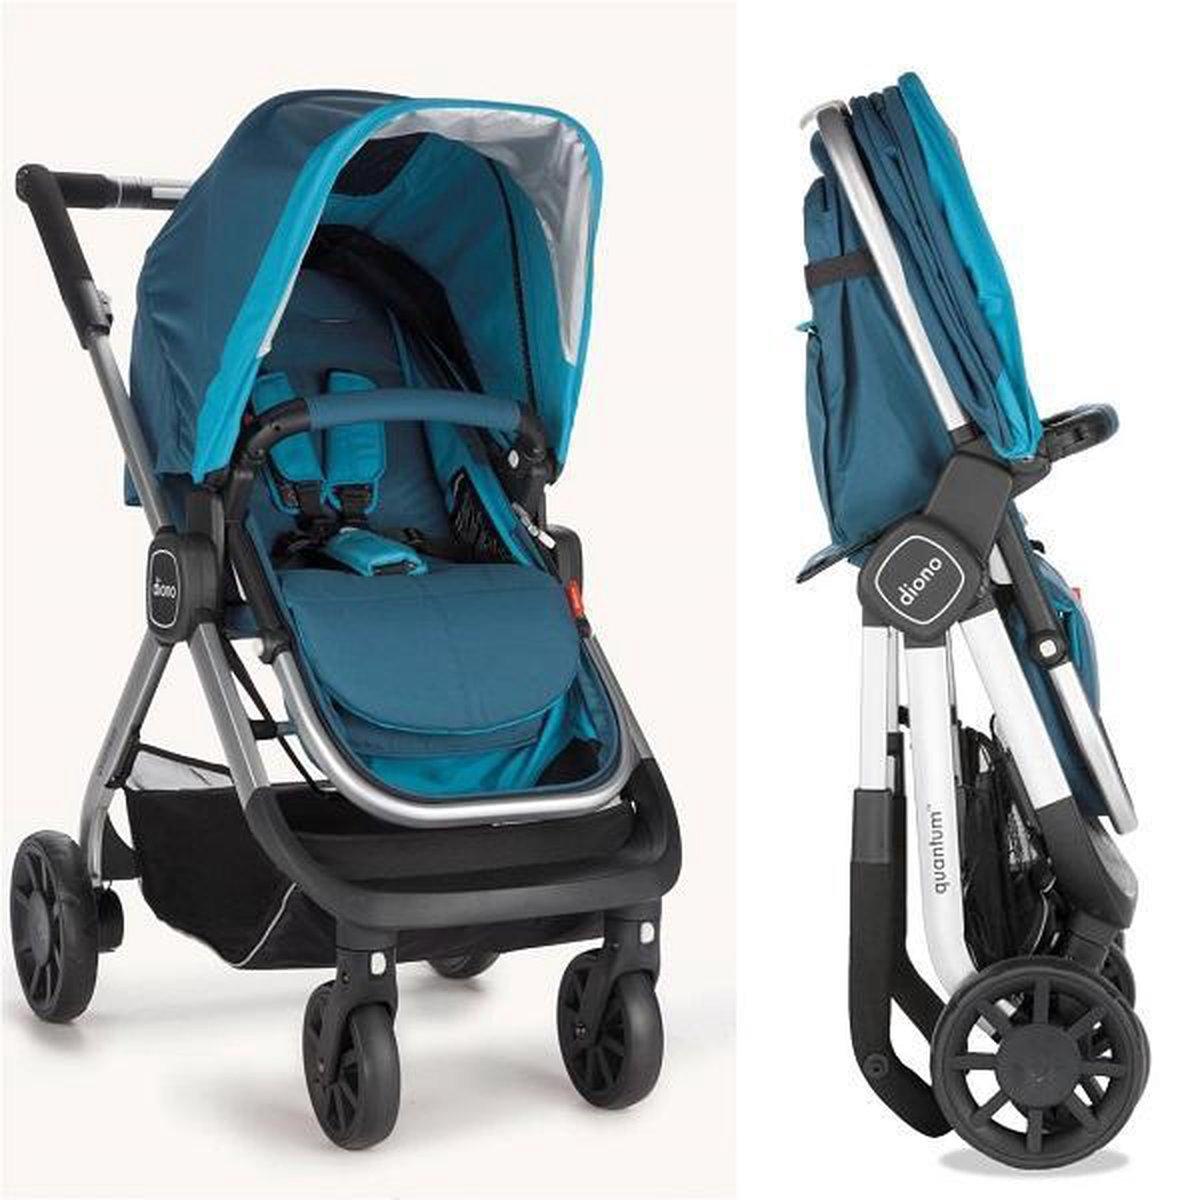 Bol Com Diono Quantum Combi Kinderwagen Voor Baby Tot Kleuter Max 22 Kg Aqua